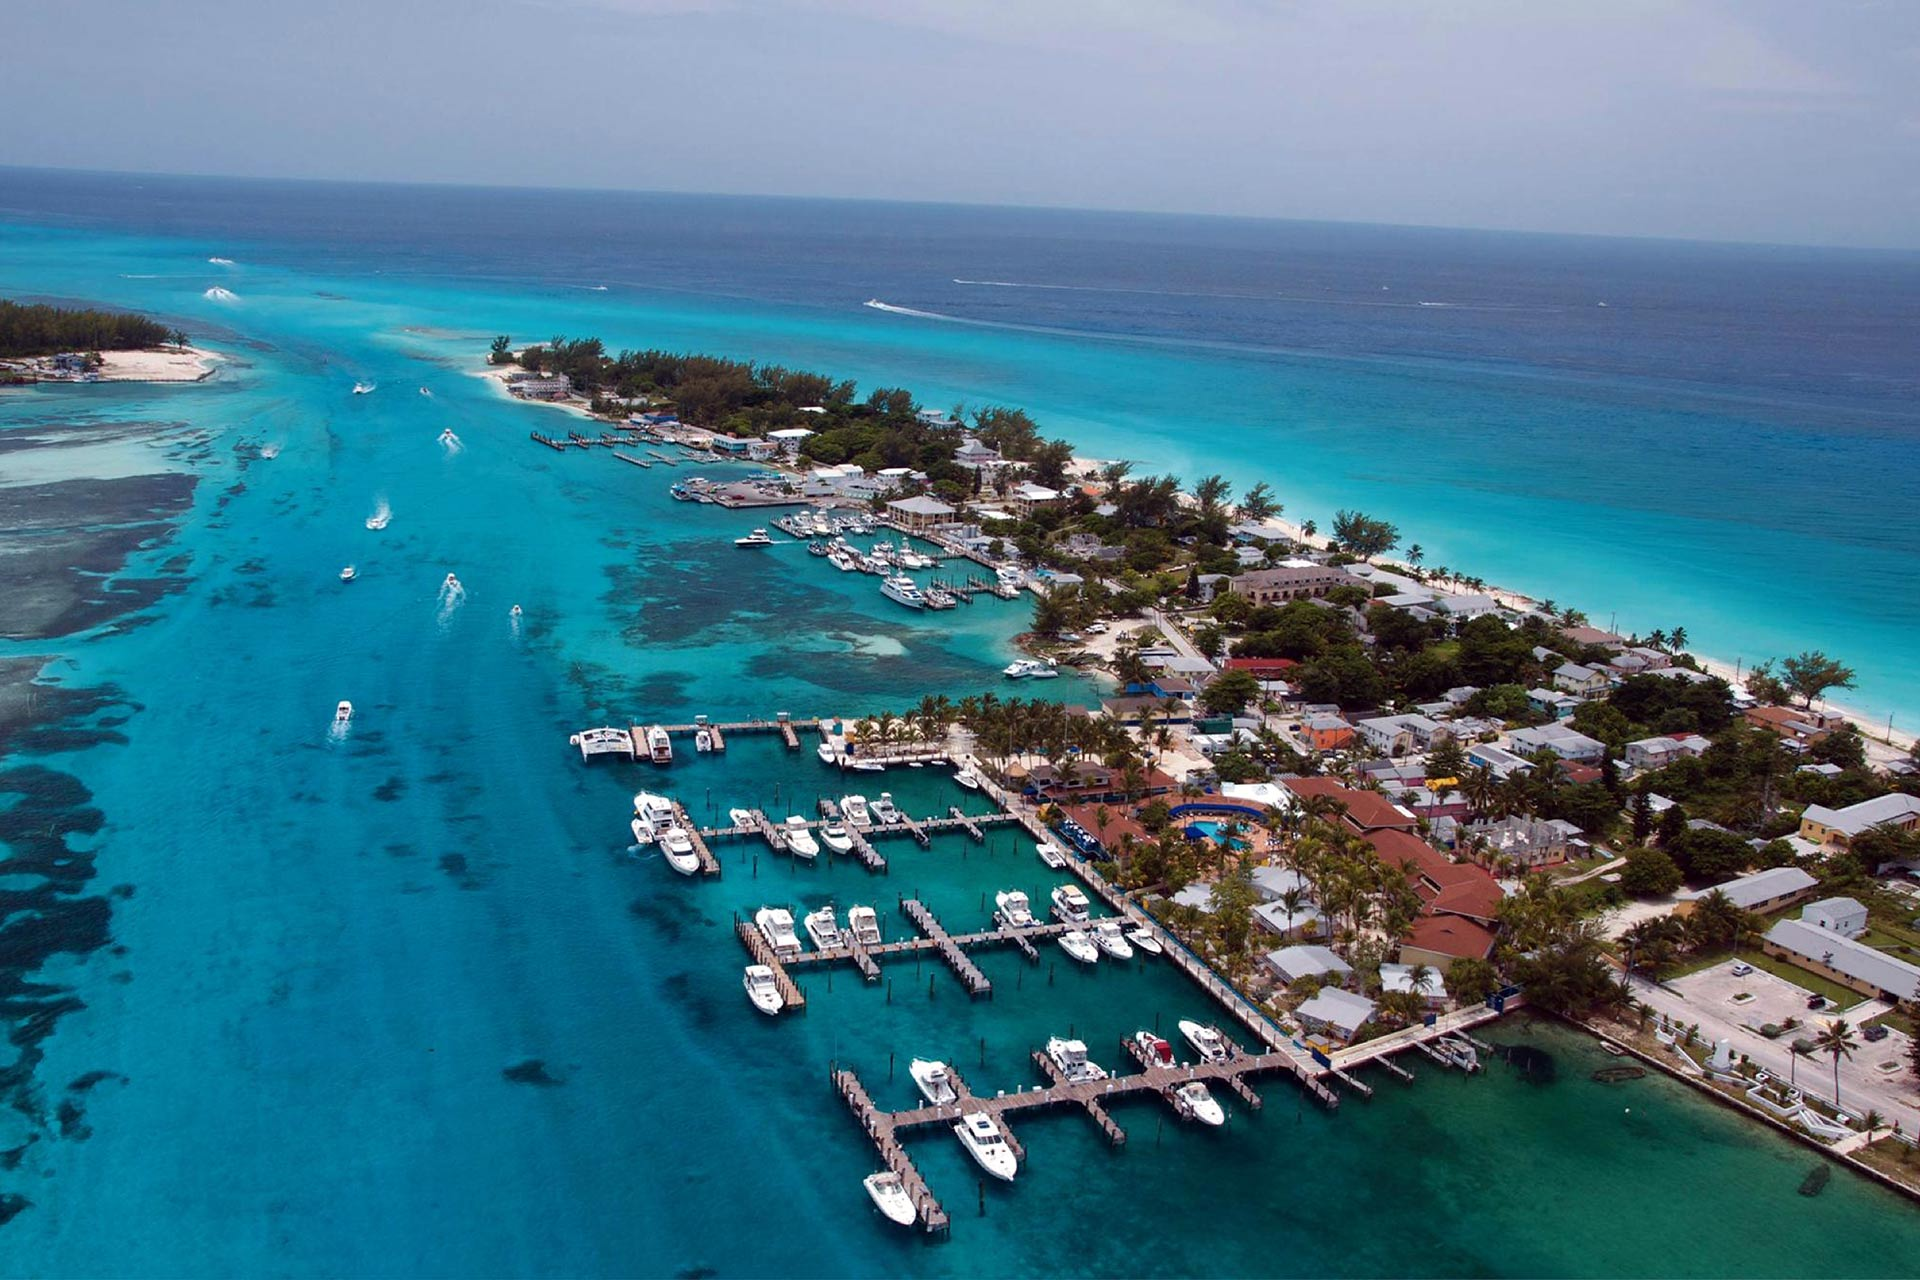 Bimini Big Game Club Resort and Marina in the Bahamas; Photo Courtesy of Bimini Big Game Club Resort and Marina